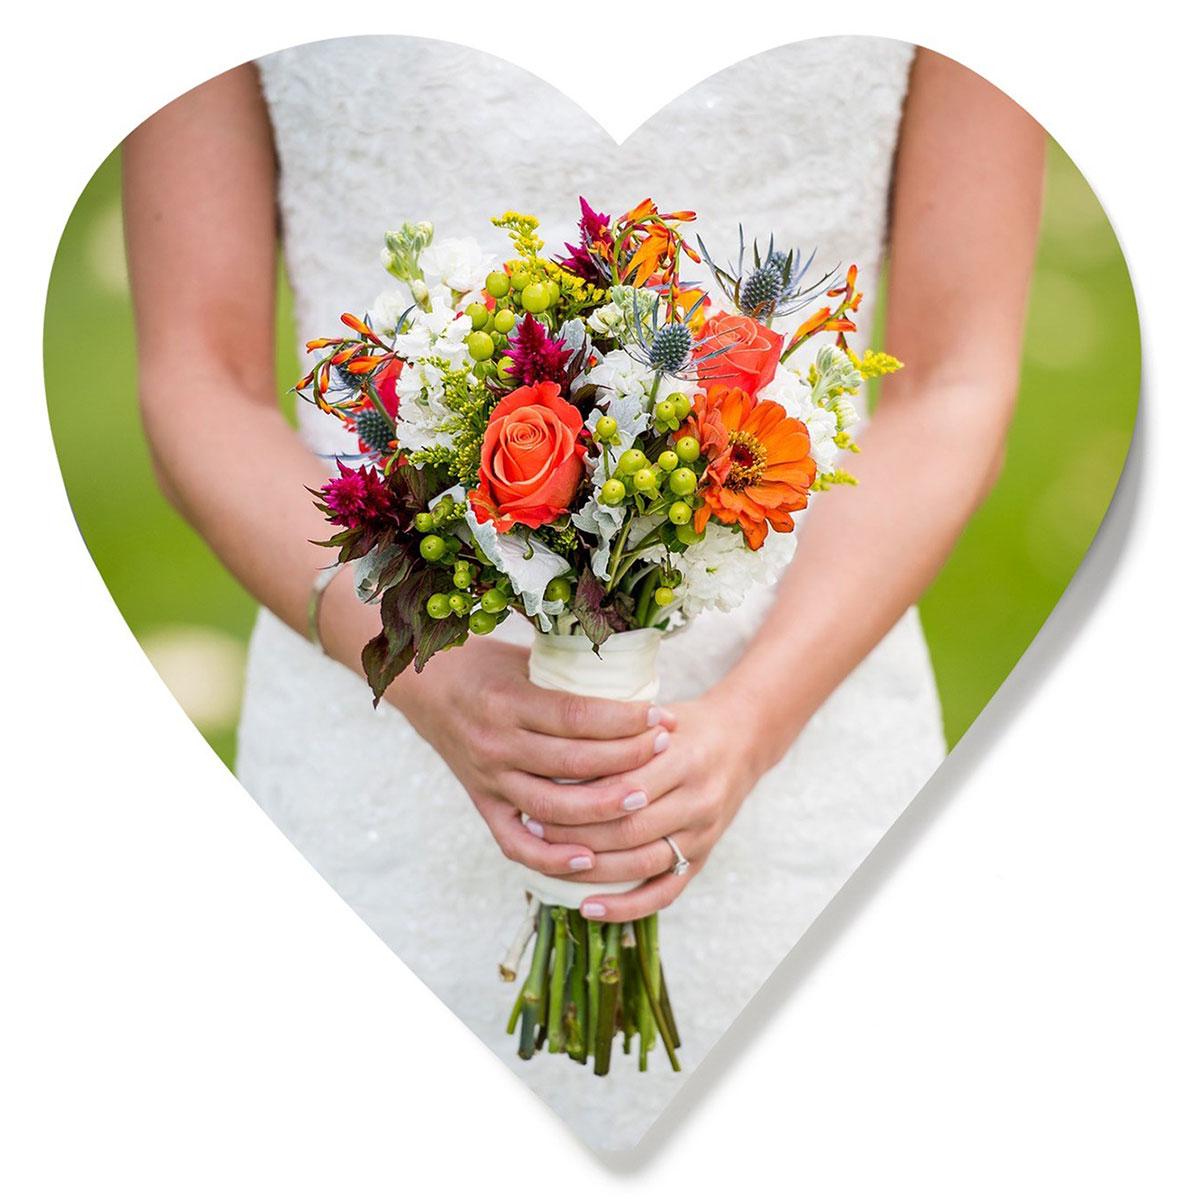 ArtisanHD Custom Cut Out Shapes Heart Photo Wedding Bouquet